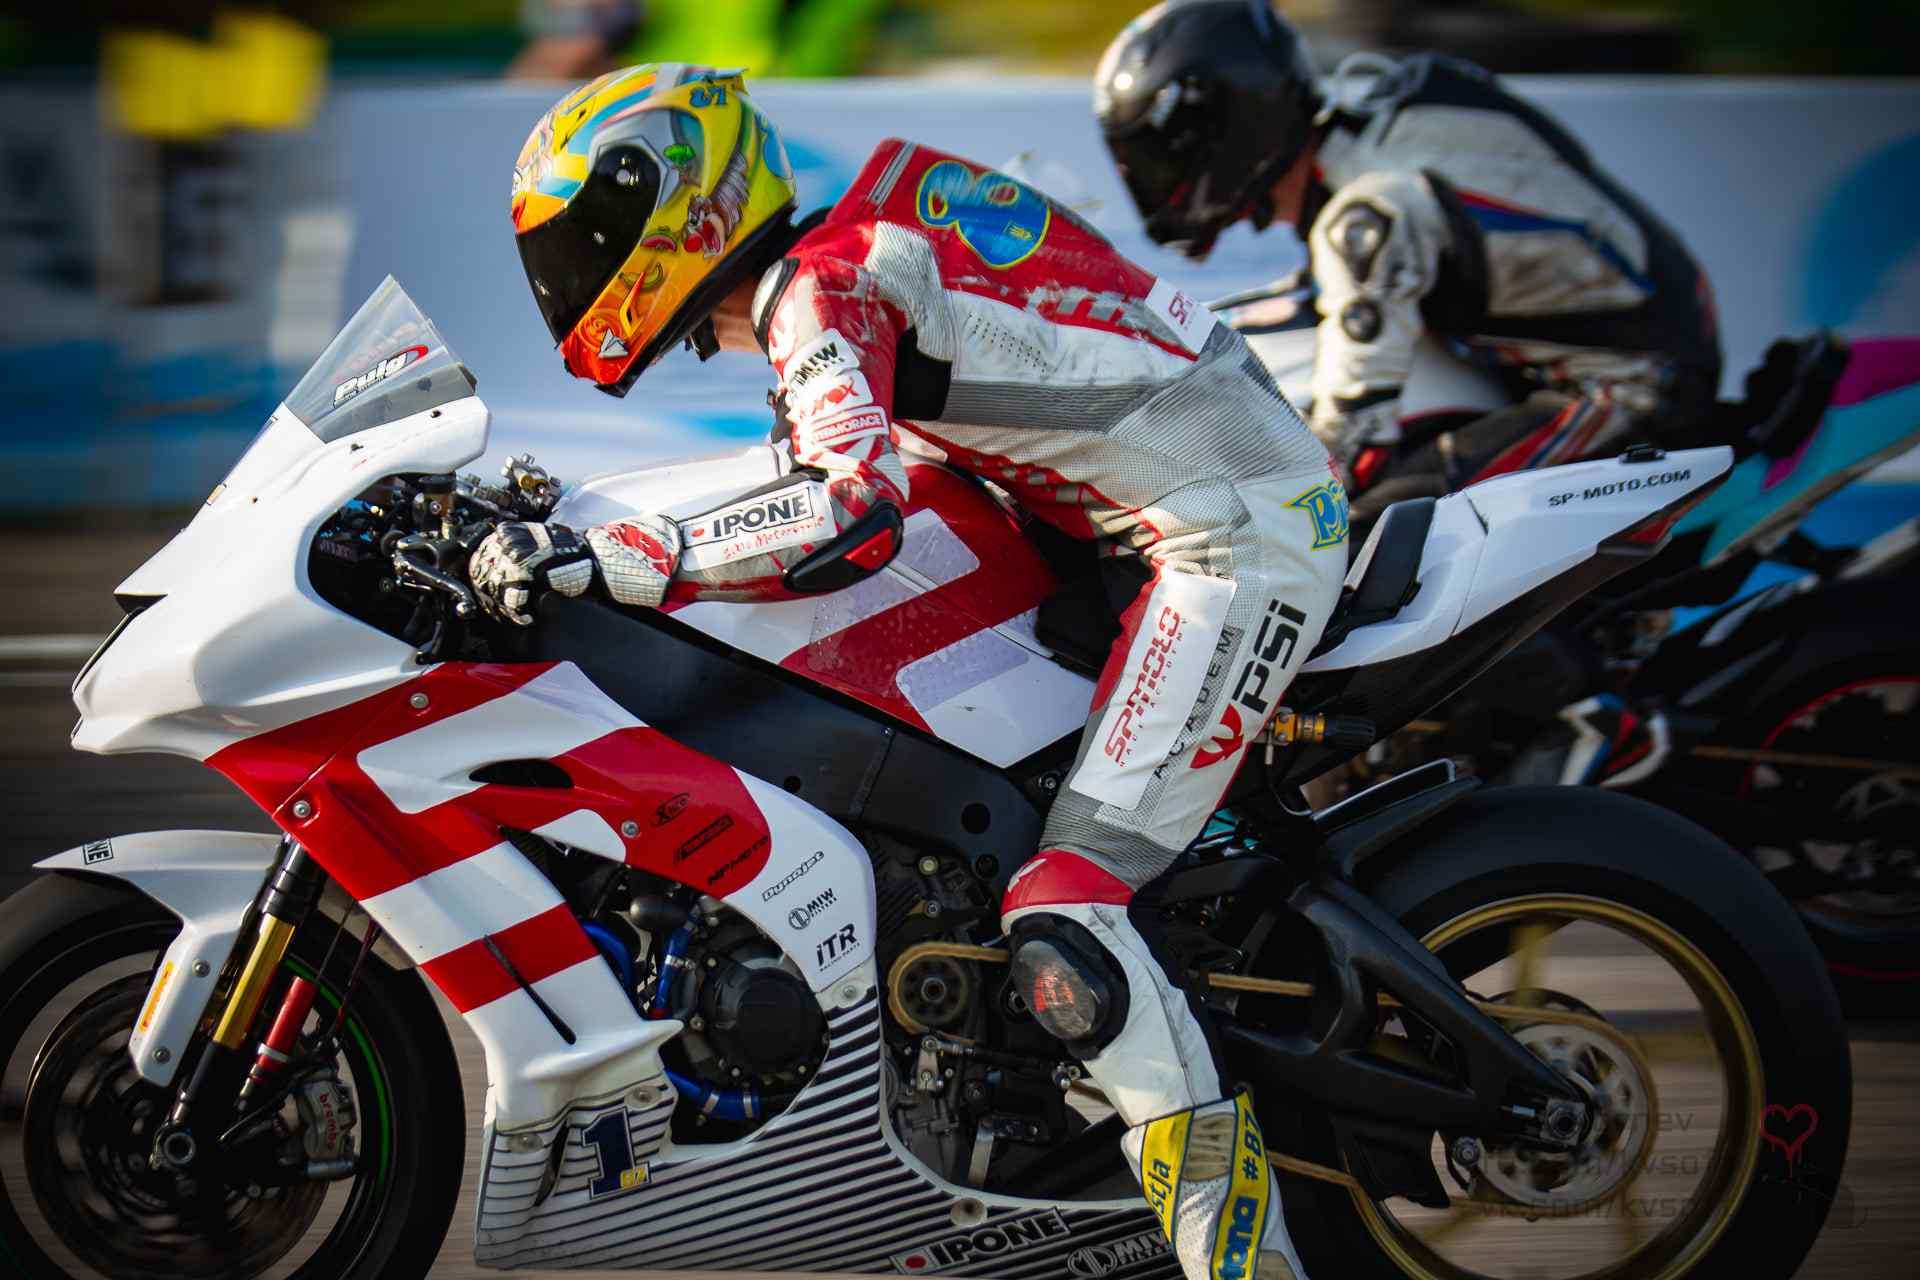 5-6_etap_MotoGPUkraine_157